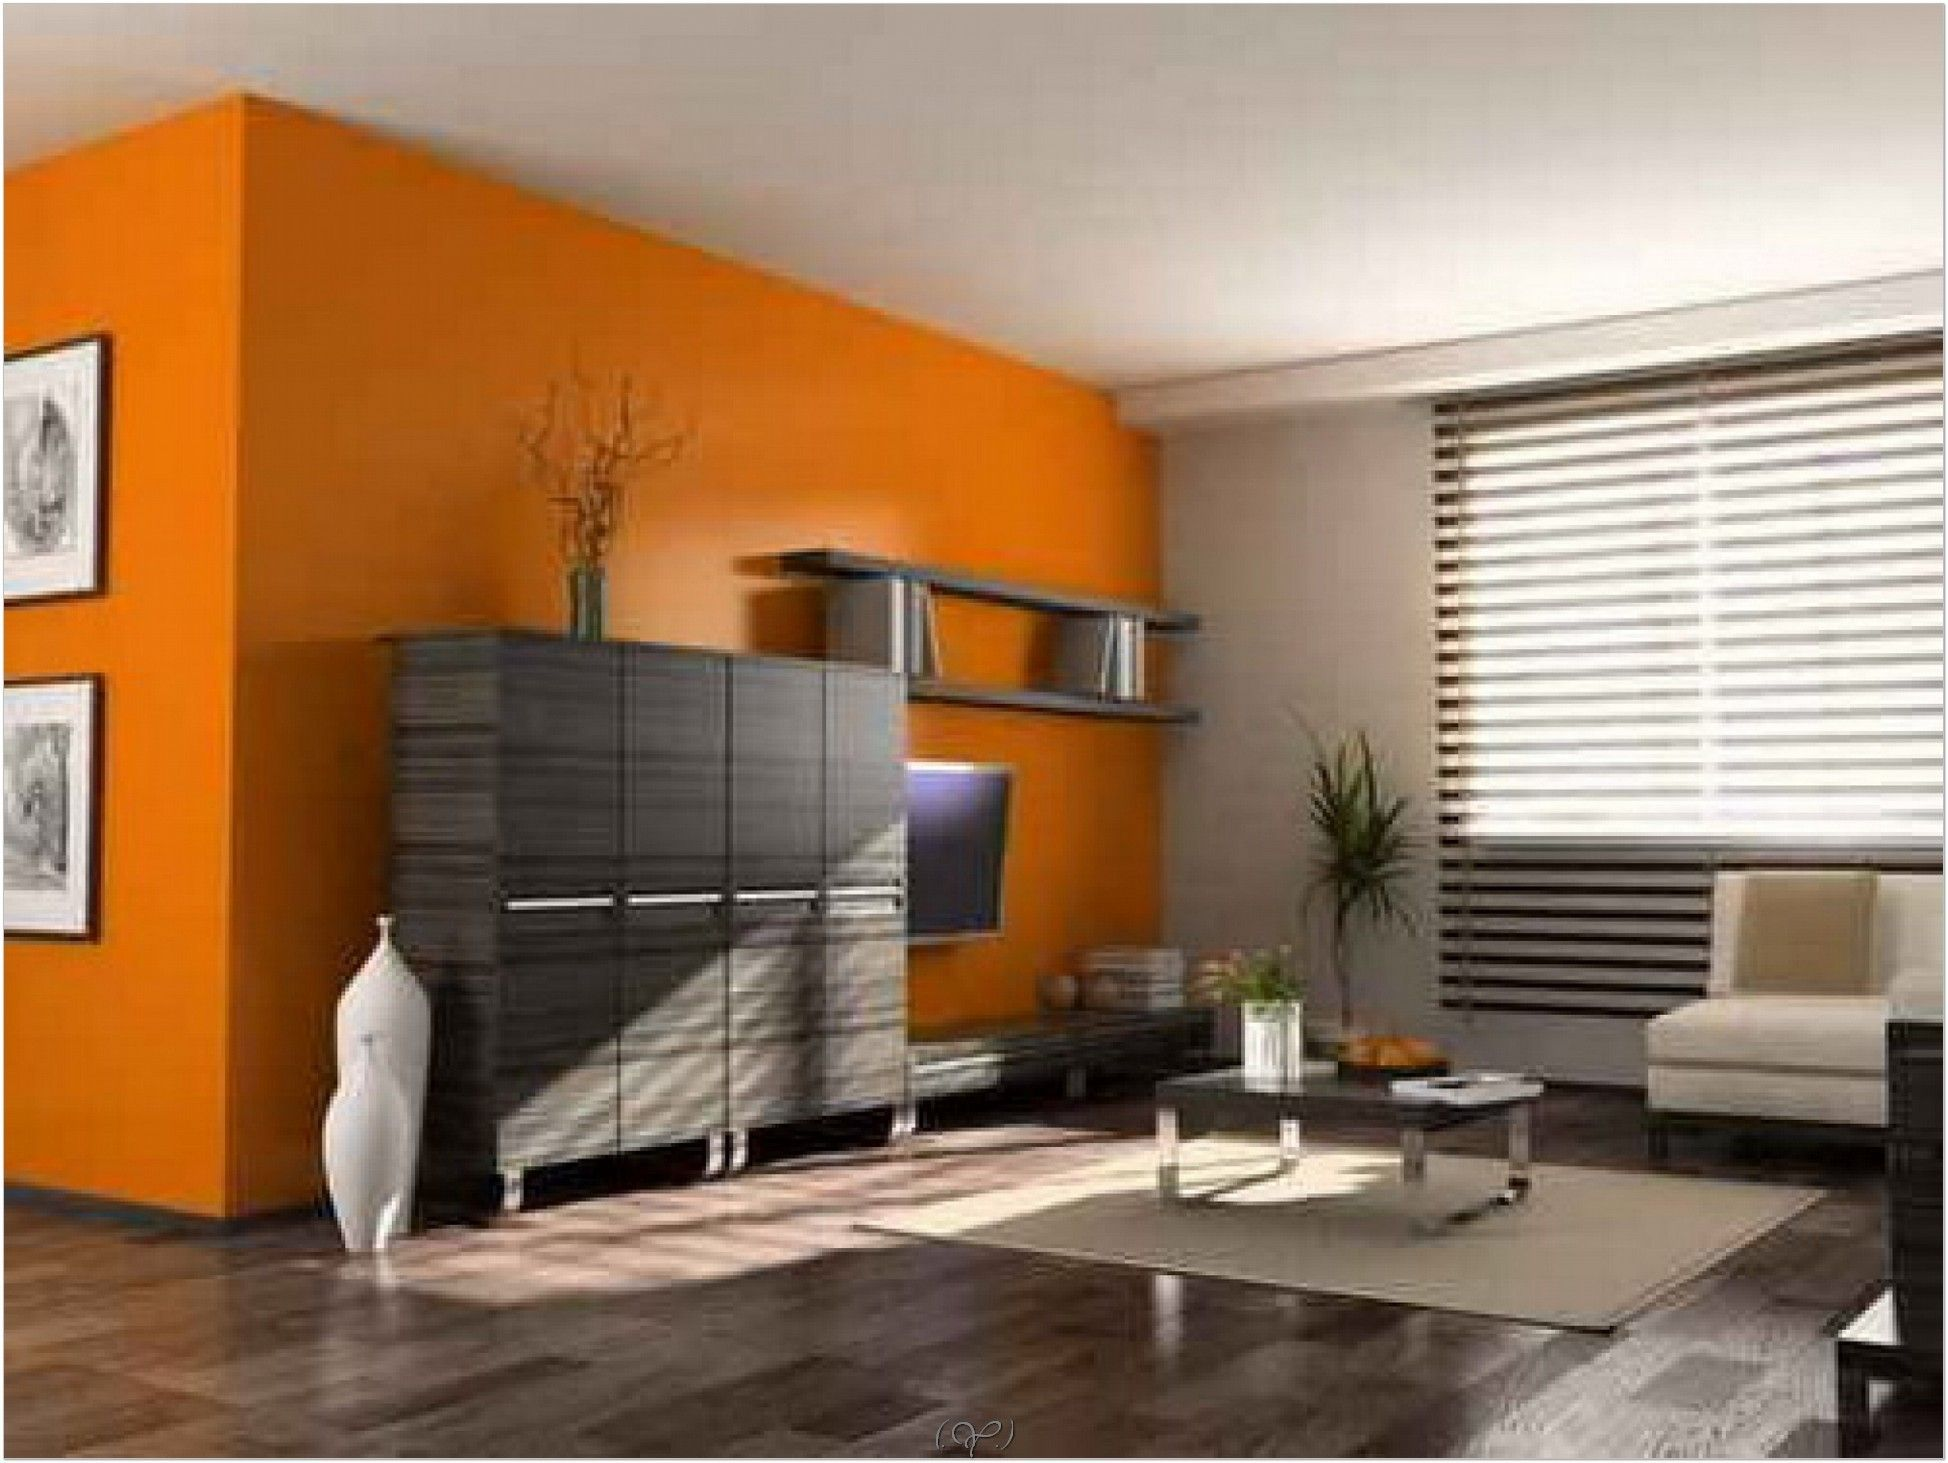 D'life home interiors ernakulam kerala icymi interior house colour schemes   quickbooksnumbers